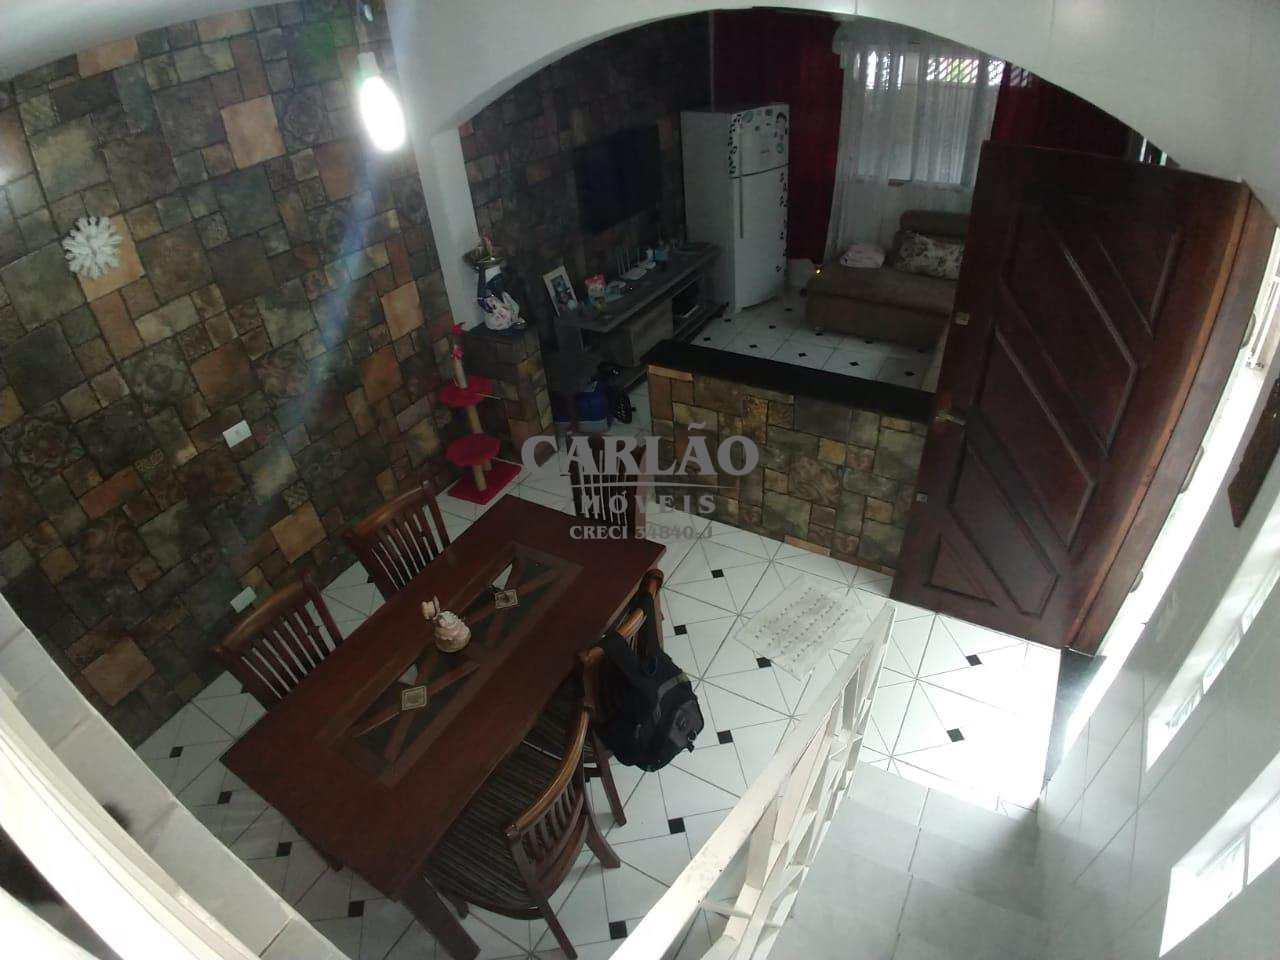 Sobrado  3 dorms,  Jussara,piscina - R$ 320 mil -cod 352205